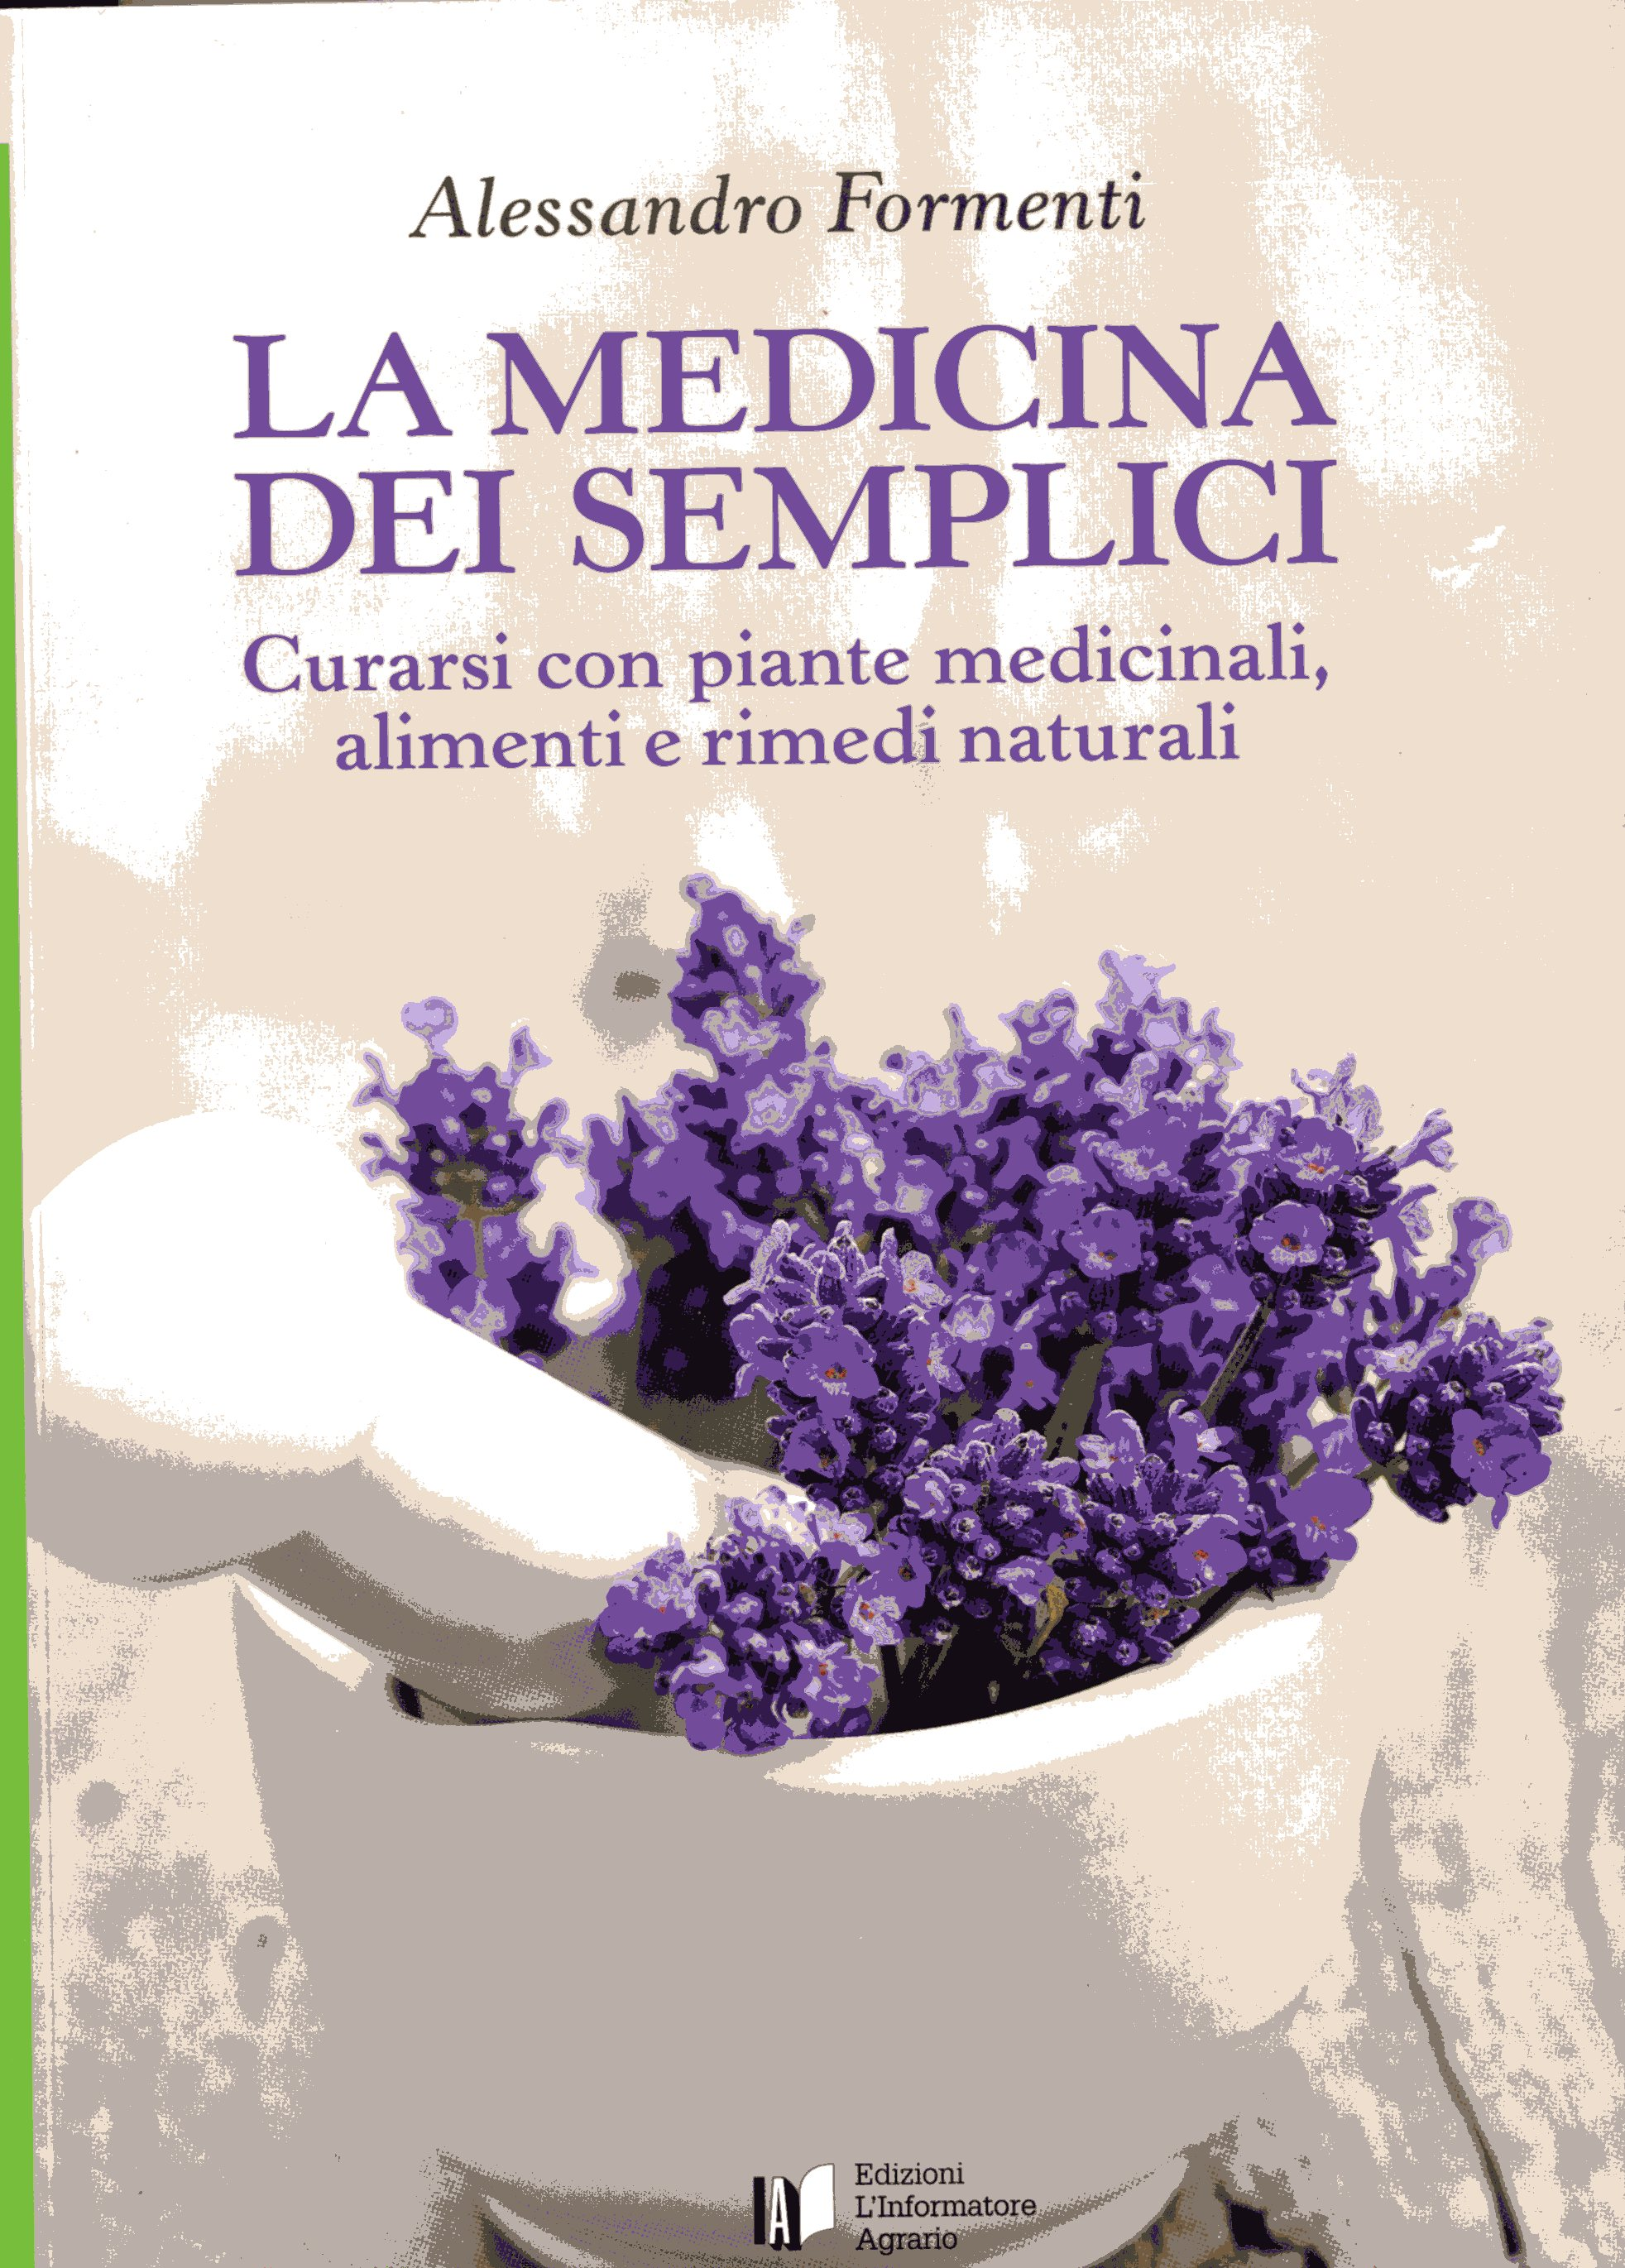 La medicina dei semplici